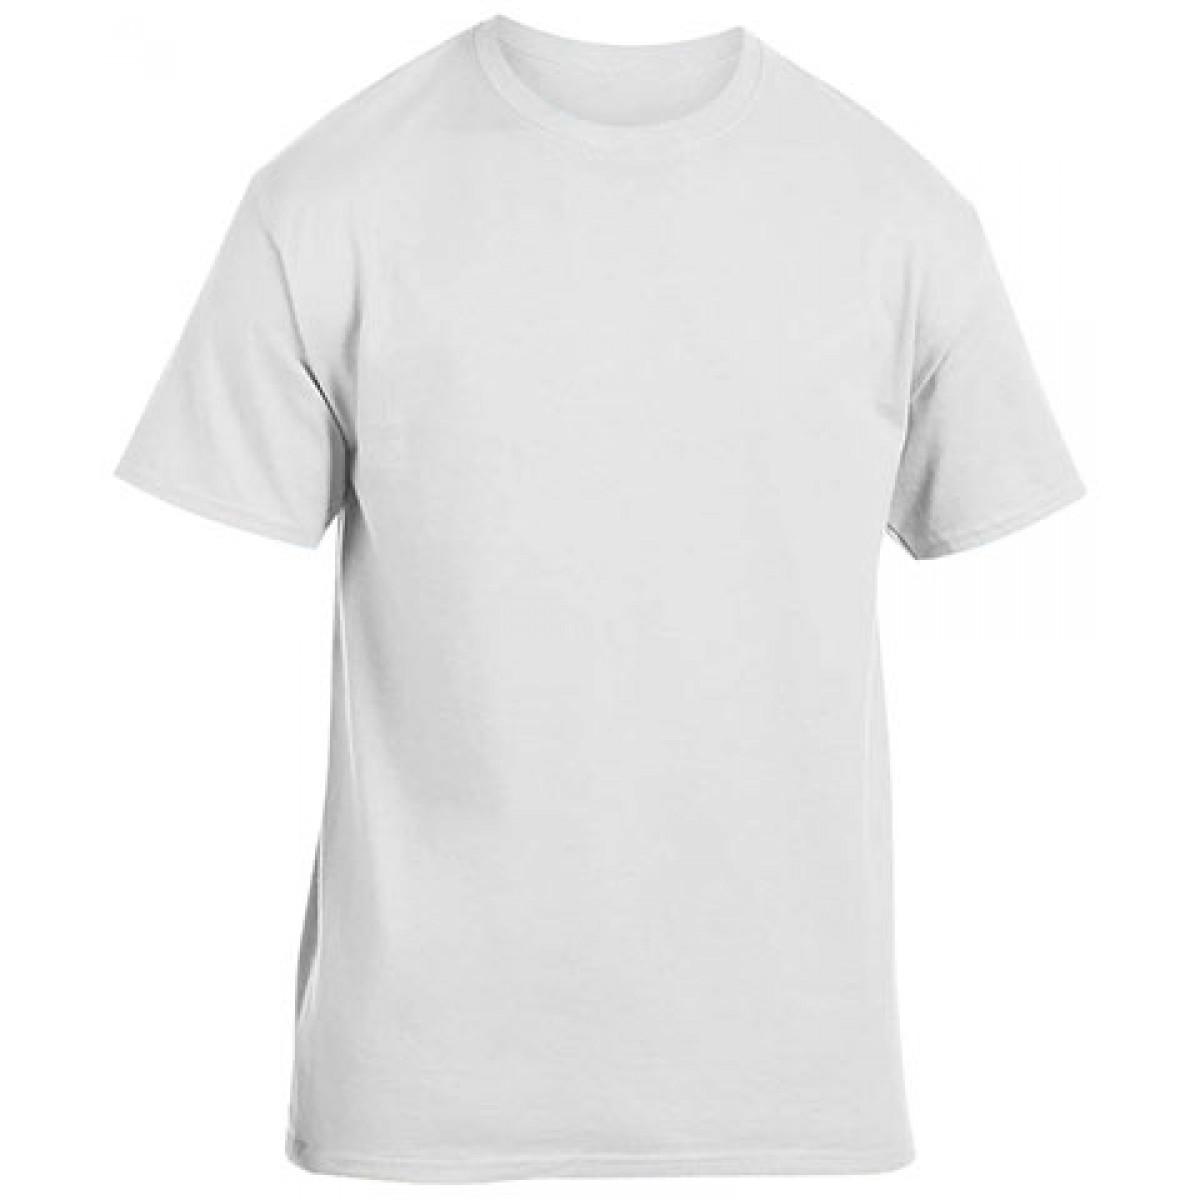 Cotton Short Sleeve T-Shirt-White-2XL